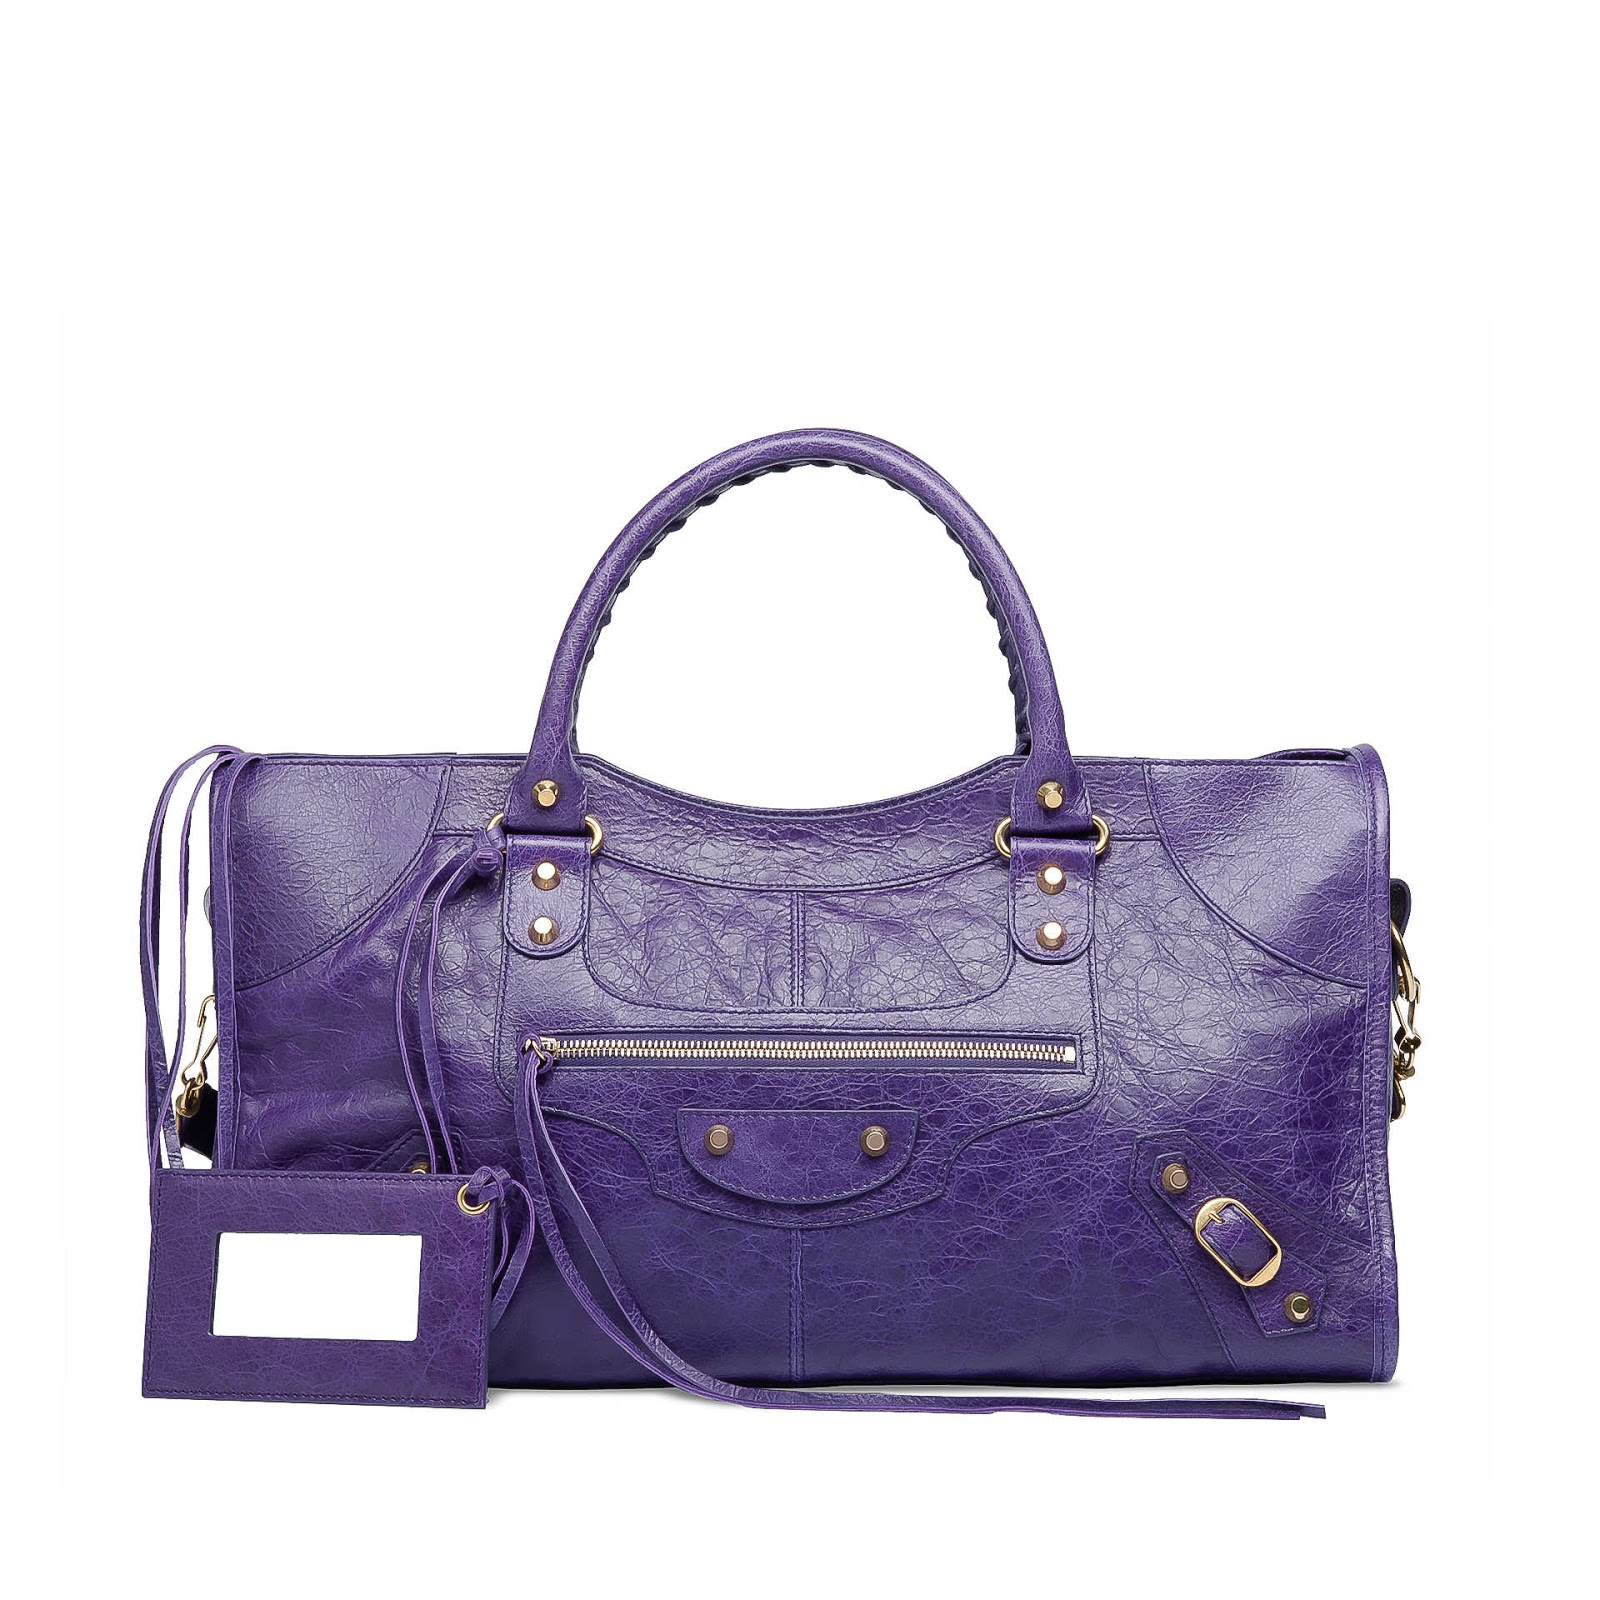 Balenciaga Limited Edition 2012